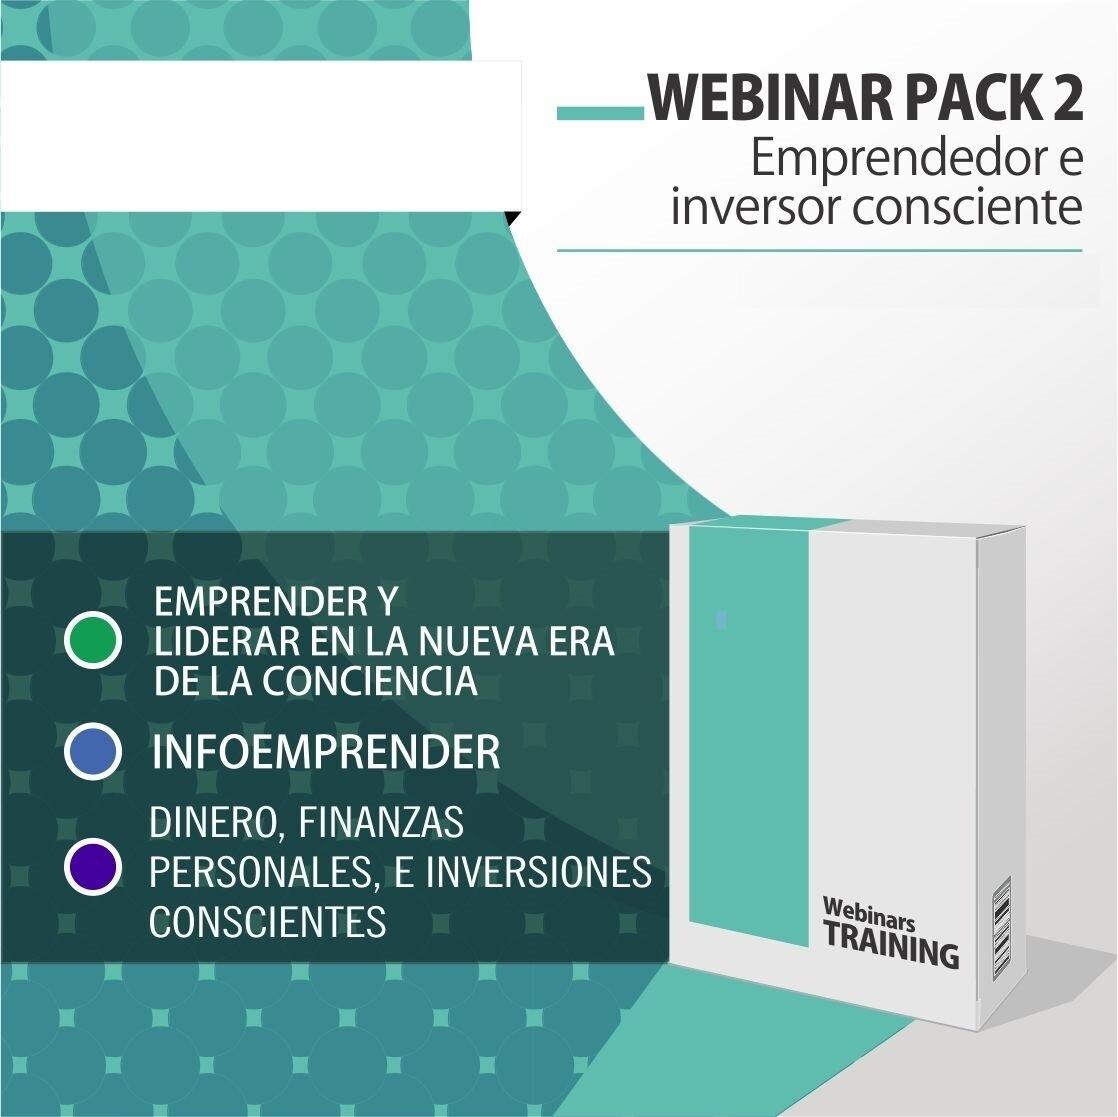 Video Cursos 2:  PACK EMPRENDEDOR E INVERSOR + PLANIFICACIÓN CONSCIENTE